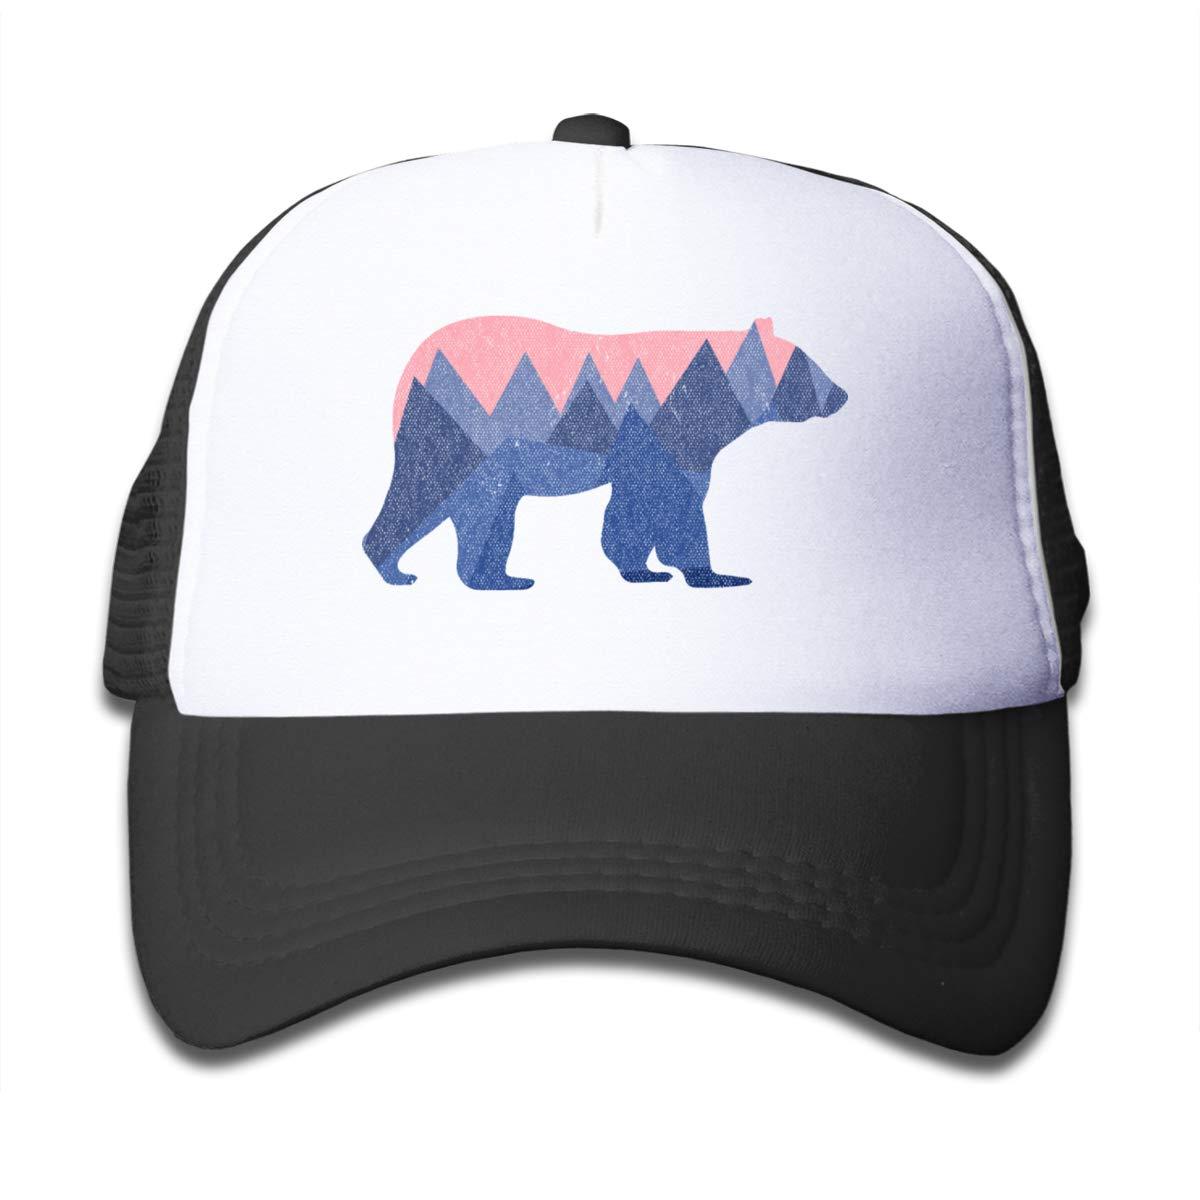 Waldeal Bear Mountain Youth Toddler Mesh Hats Boys and Girls Baseball Trucker Cap Black